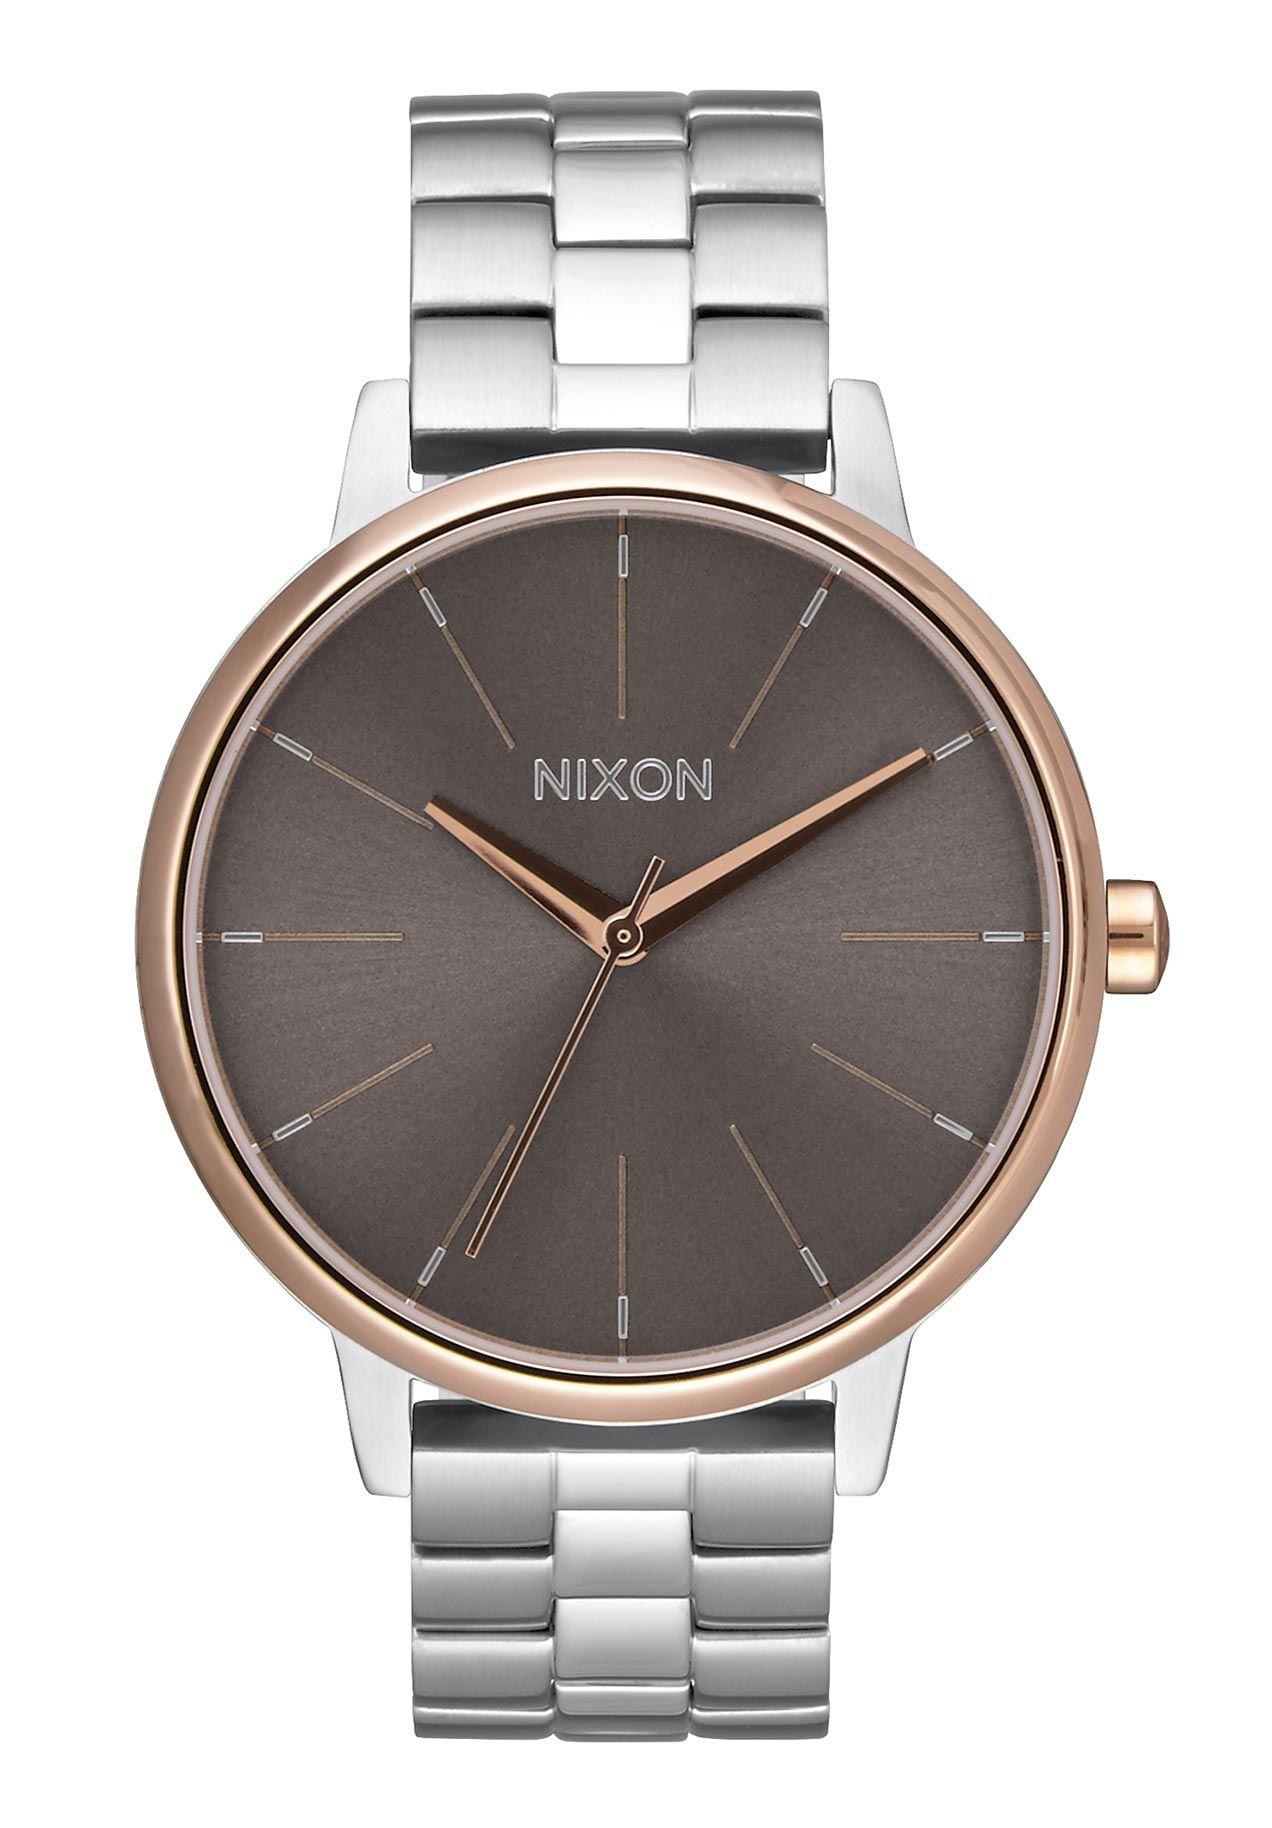 Nixon The Kensington Silver / Rose Gold / Taupe